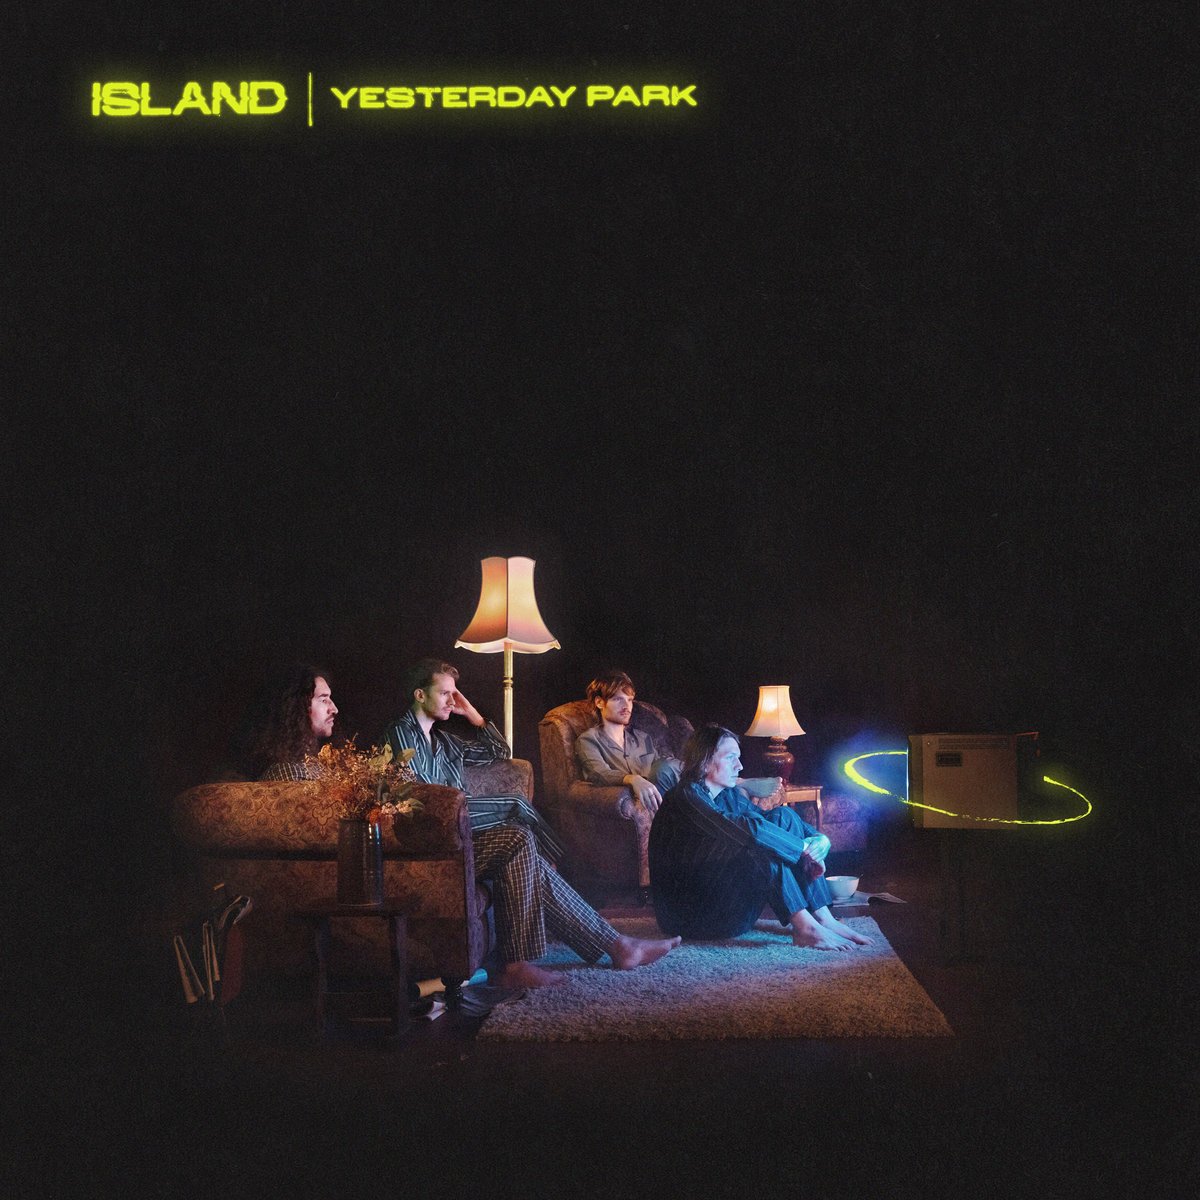 ISLAND – Yesterday Park